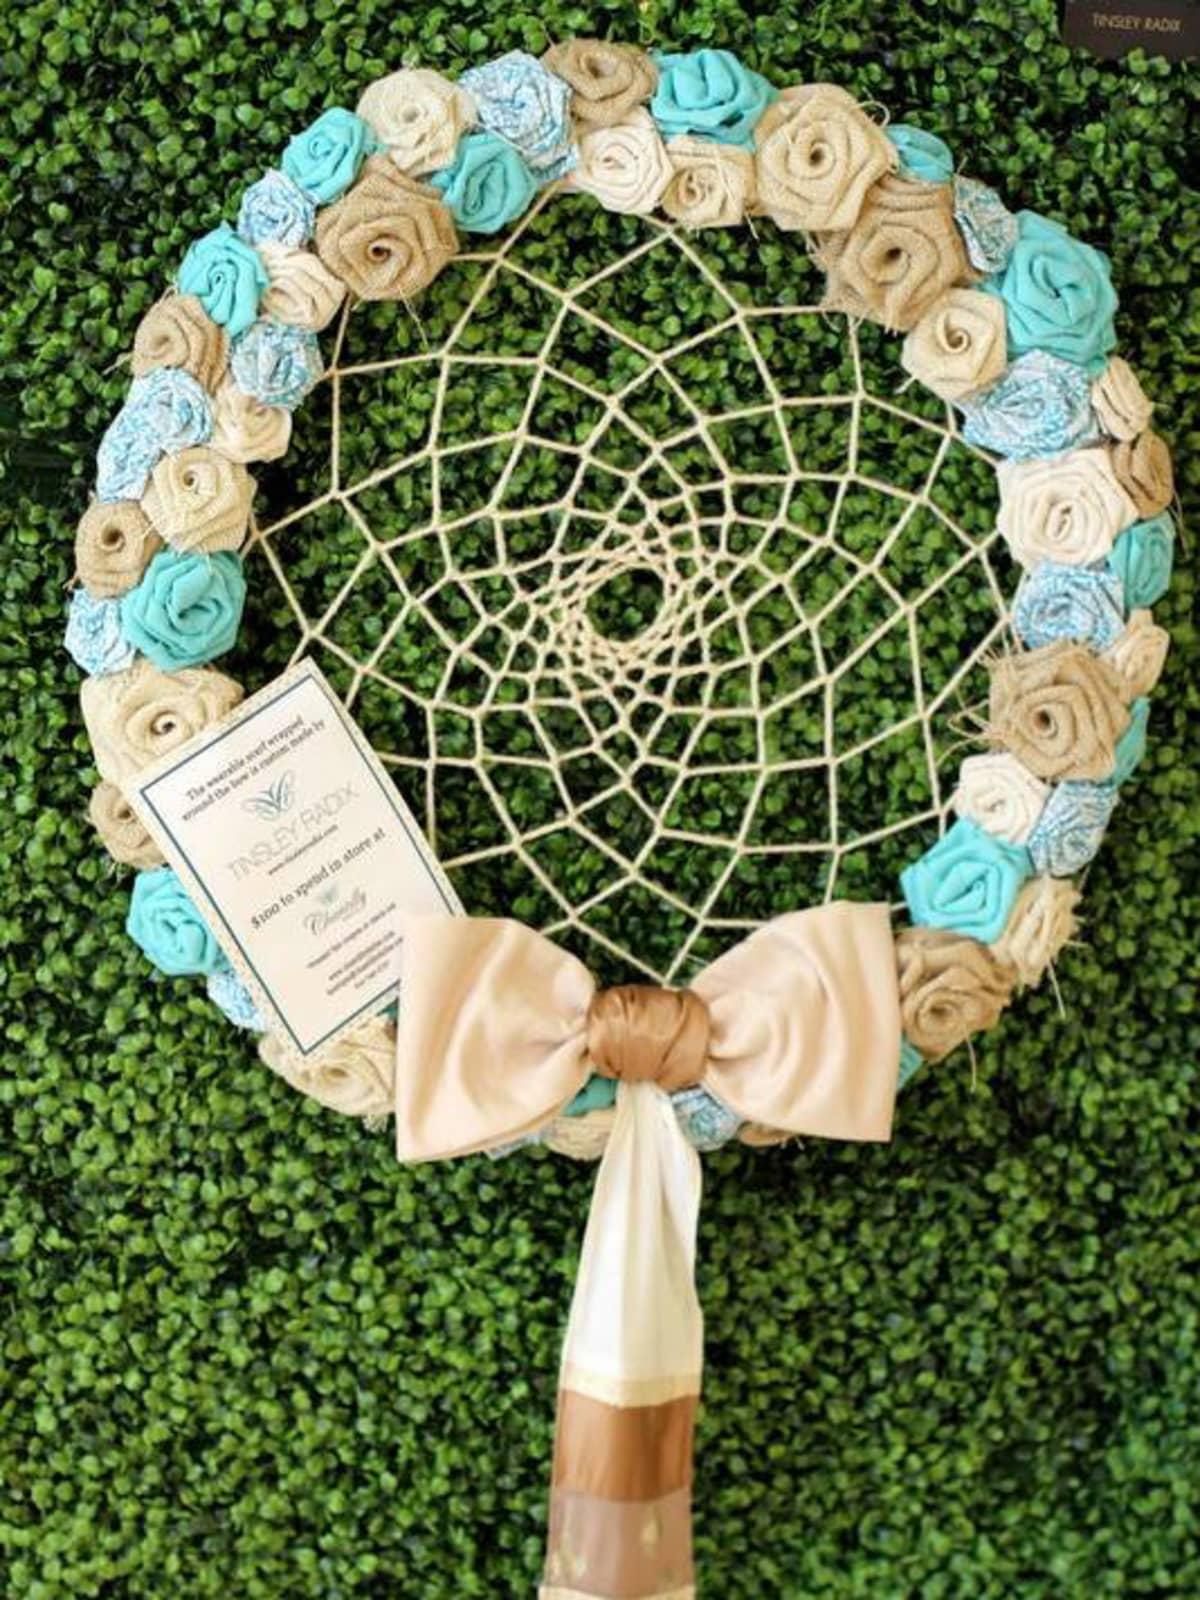 Tinsley Radix wreath at DIFFA 2014